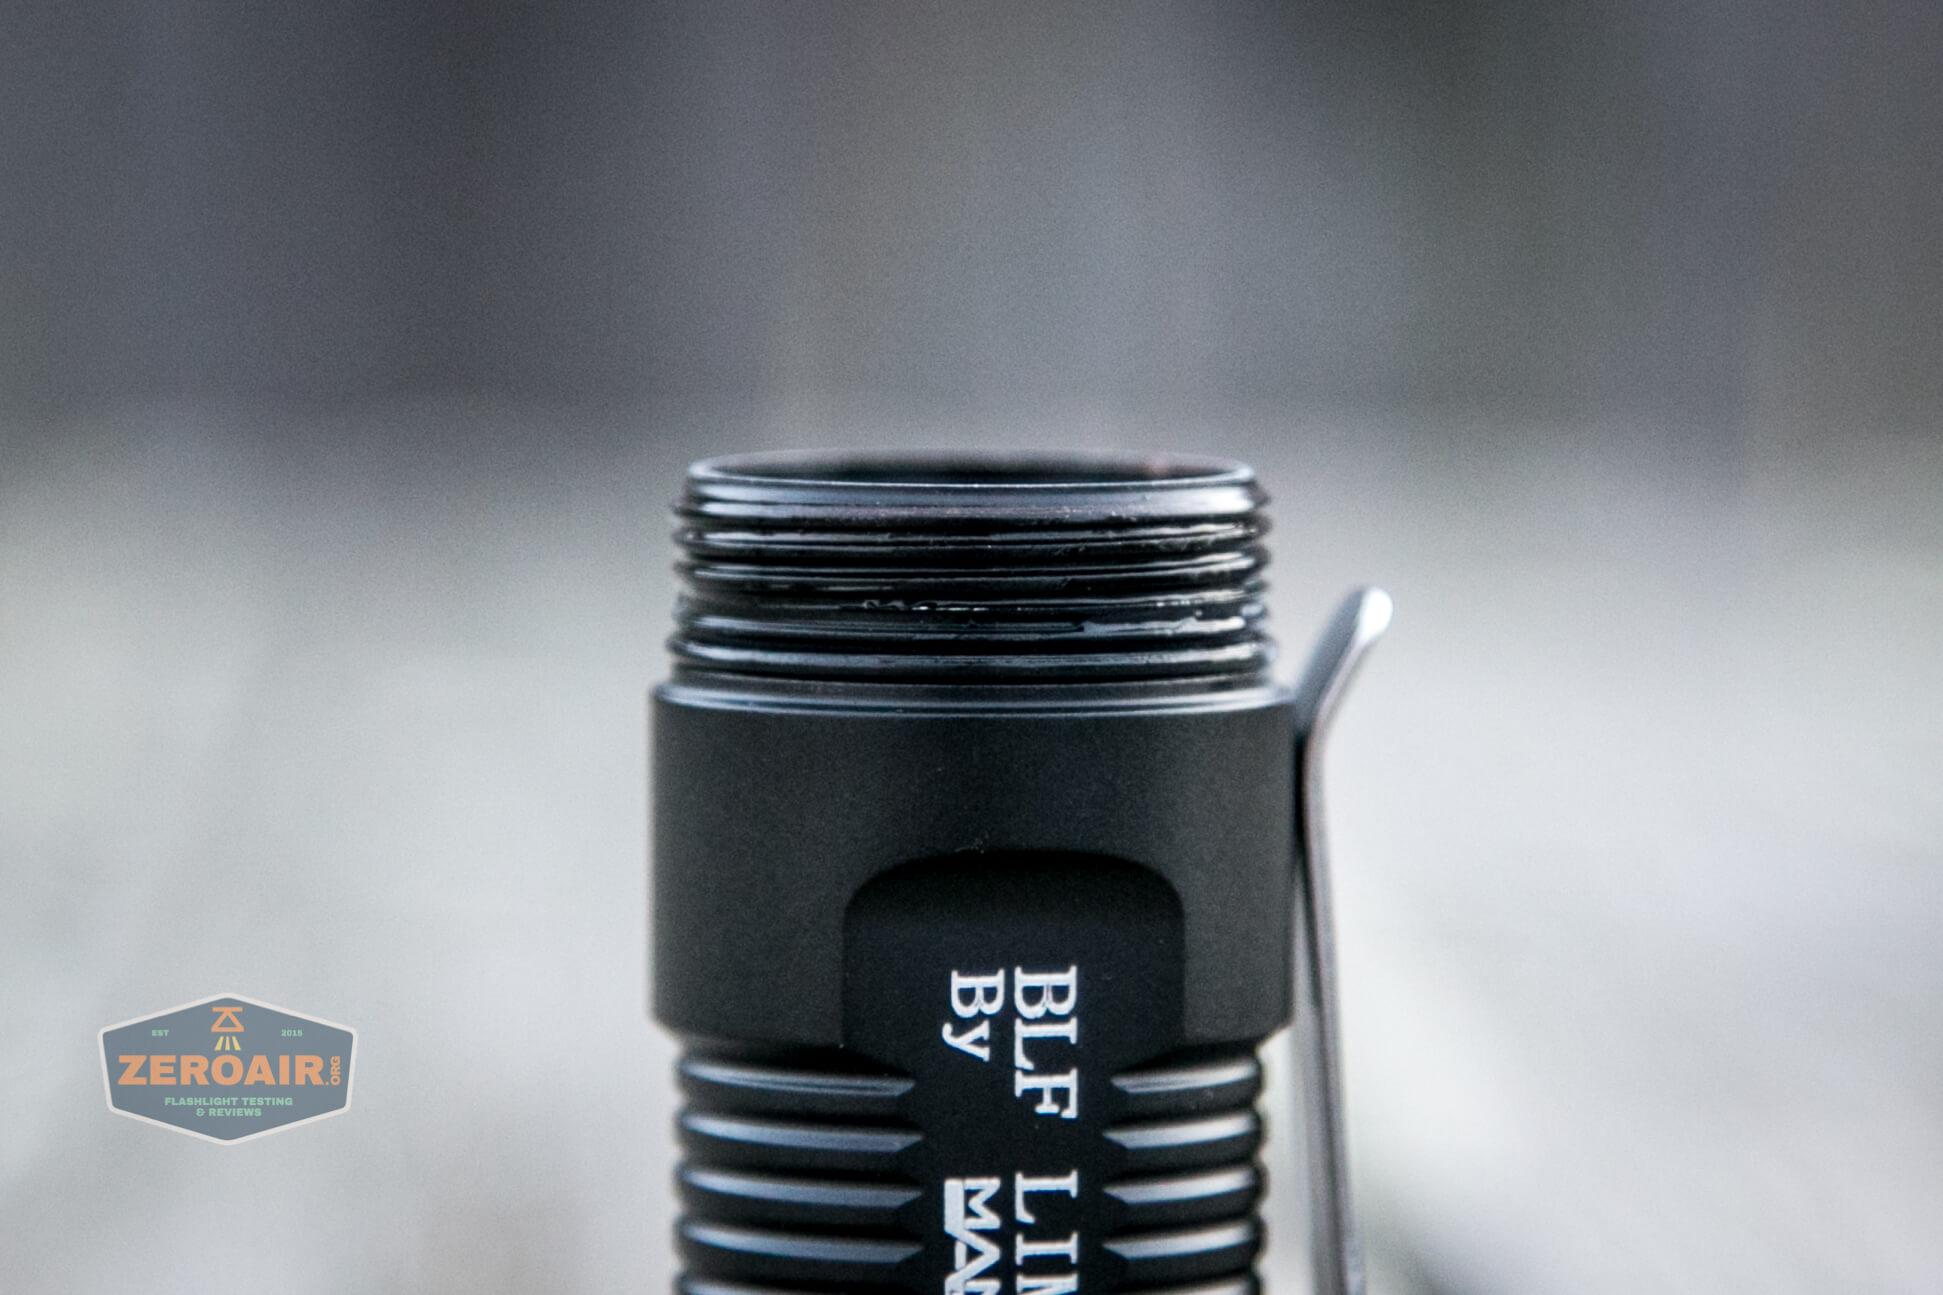 manker e14iii 18350 flood flashlight threads